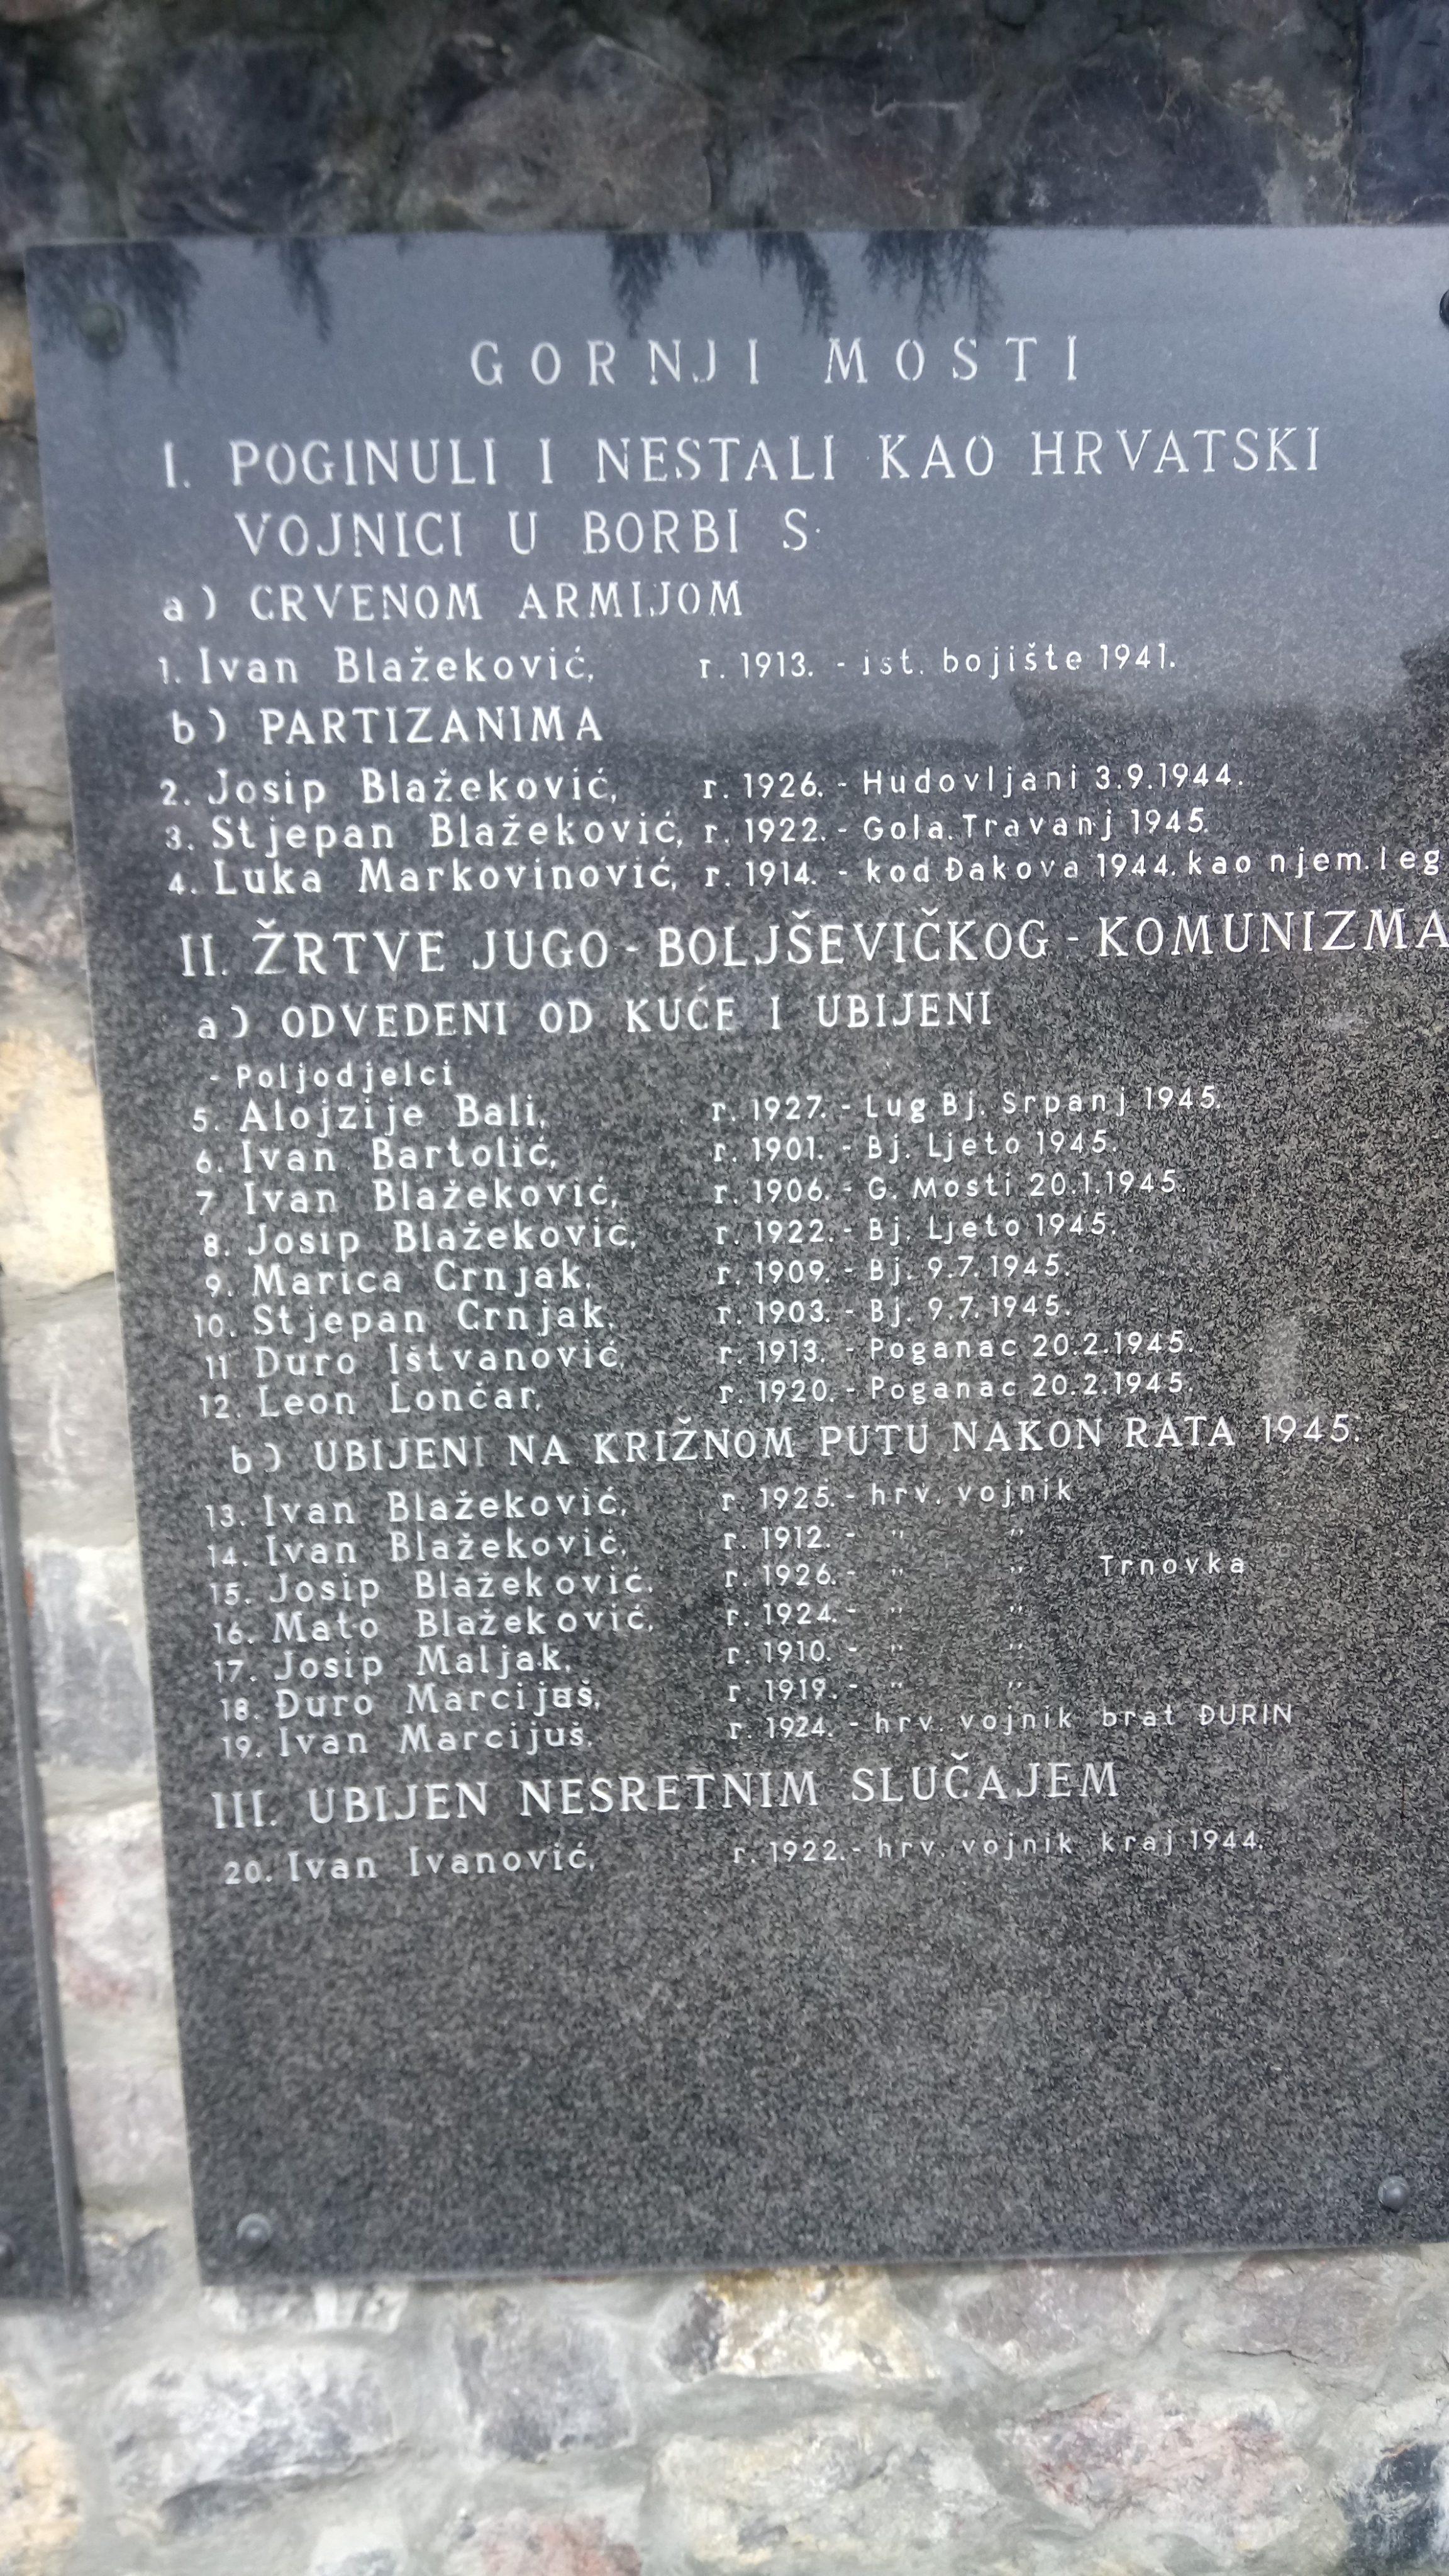 Foto Zločin Konjičkog Puka Car Dušan Silni Nad Hrvatskim